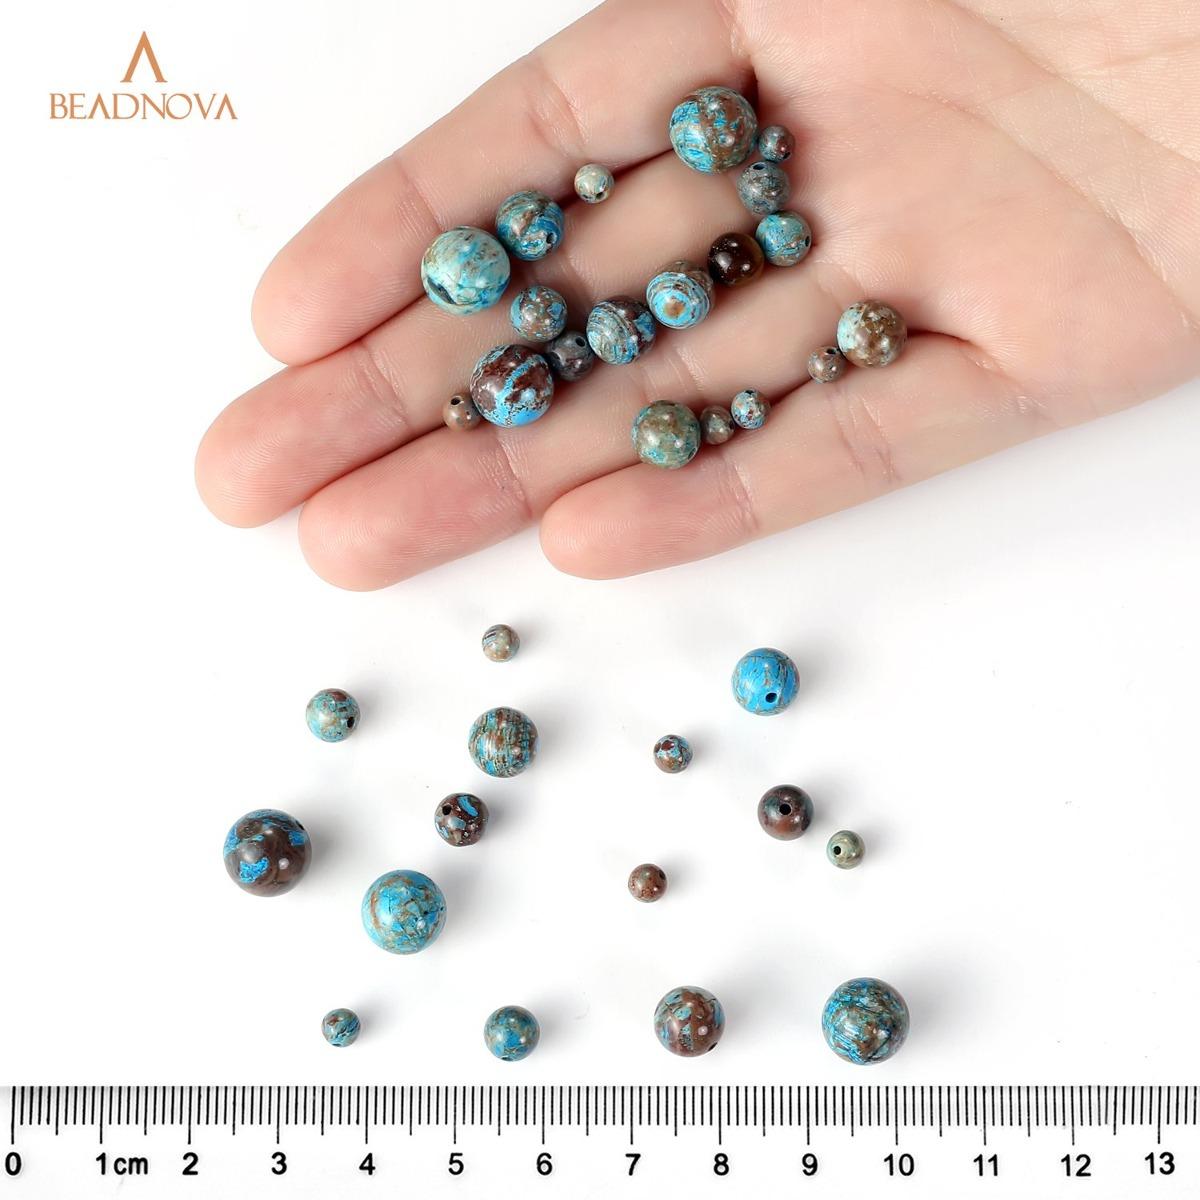 BEADNOVA 8mm Blue Turquoise Gemstone Round Loose Beads for Jewelry Making 45-48pcs